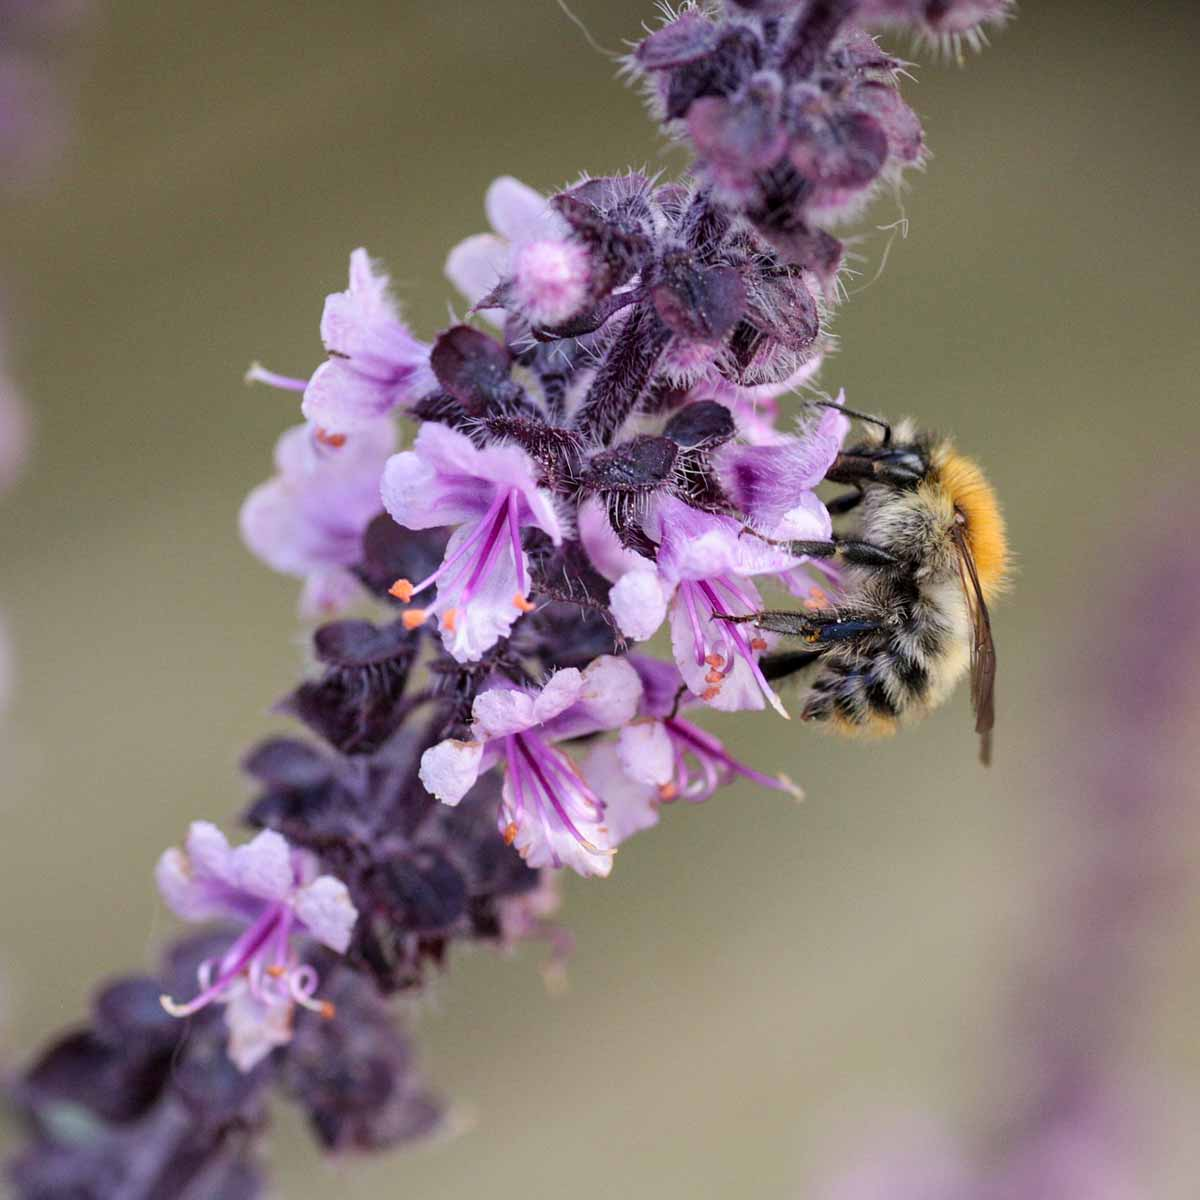 A bee on a purple basil flower